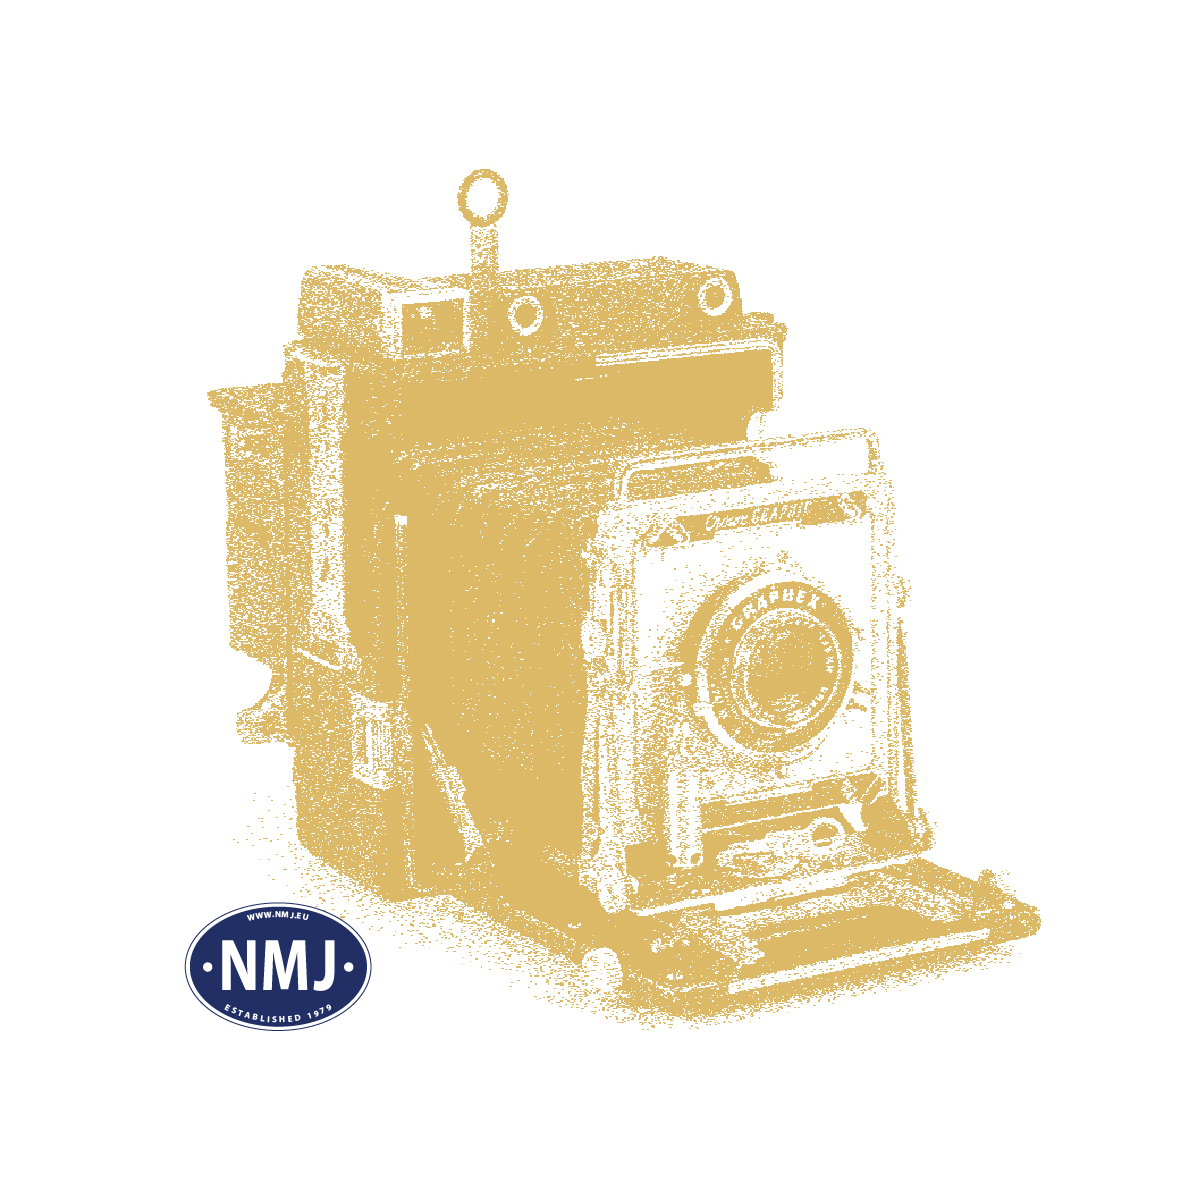 NMJT202.001 - NMJ Topline SJ ABo2 4854, 1/2 Cl. Passenger coach, old SJ logo